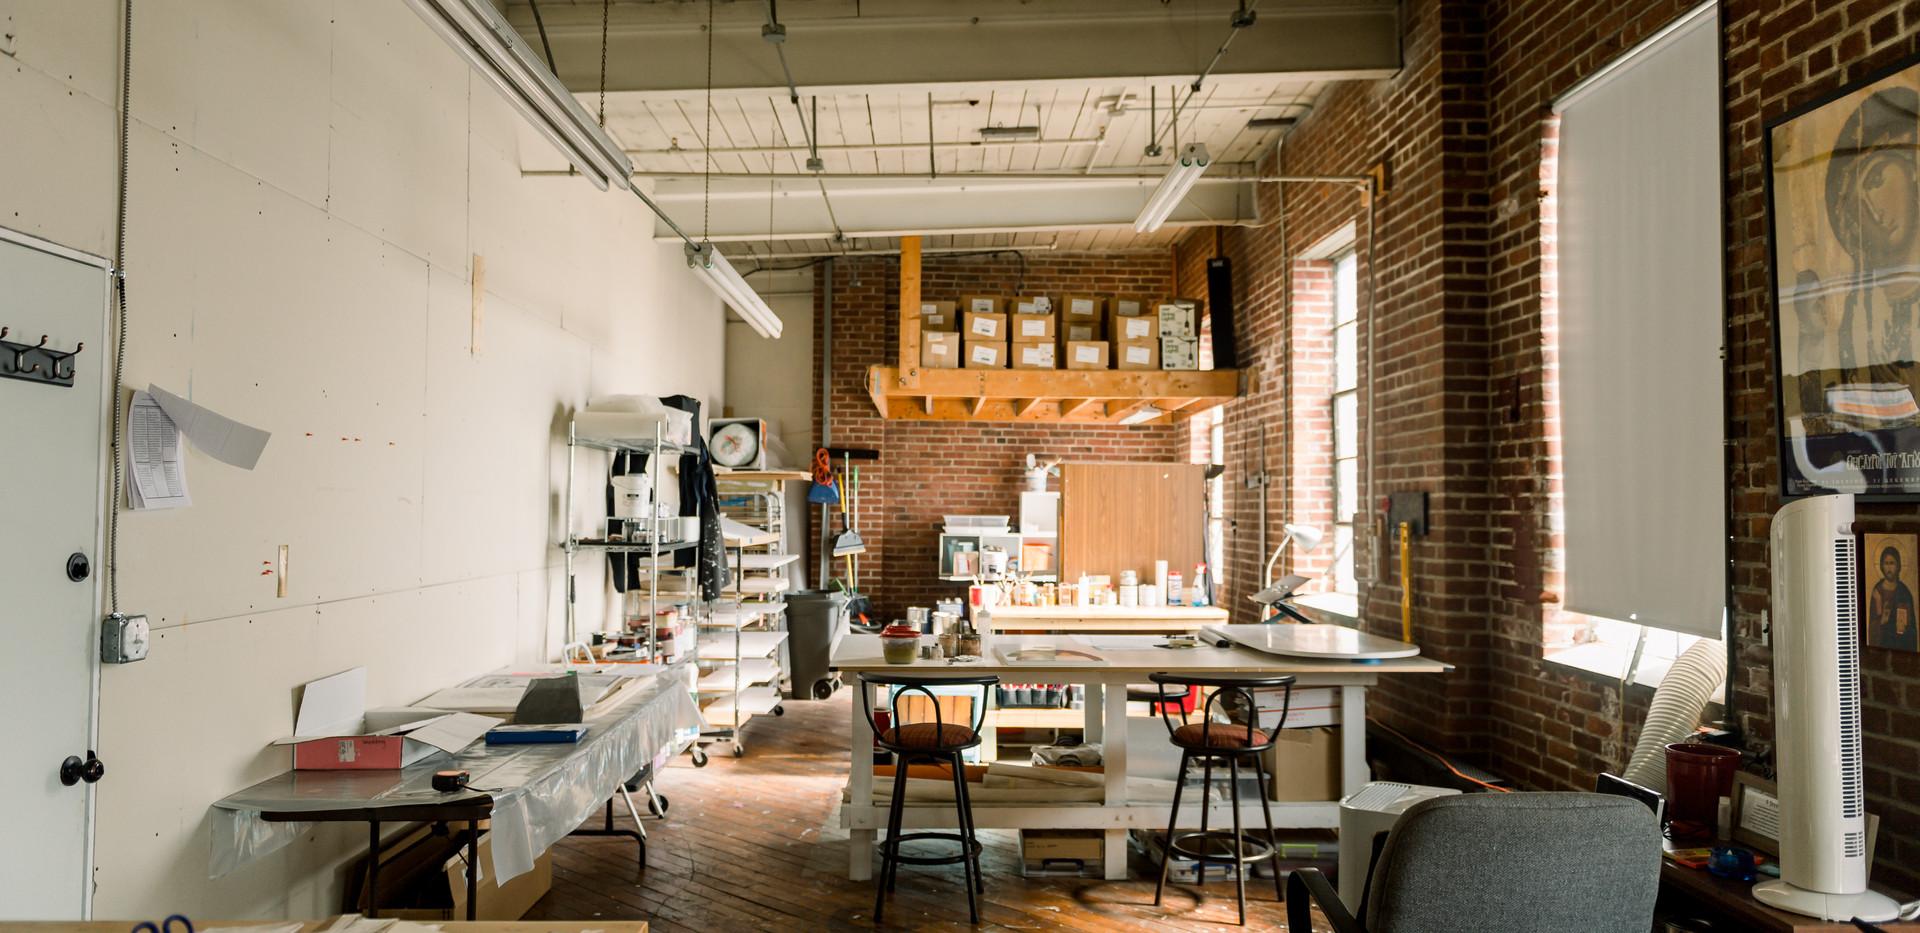 norwood-commerce-center-studio-space-6.jpg